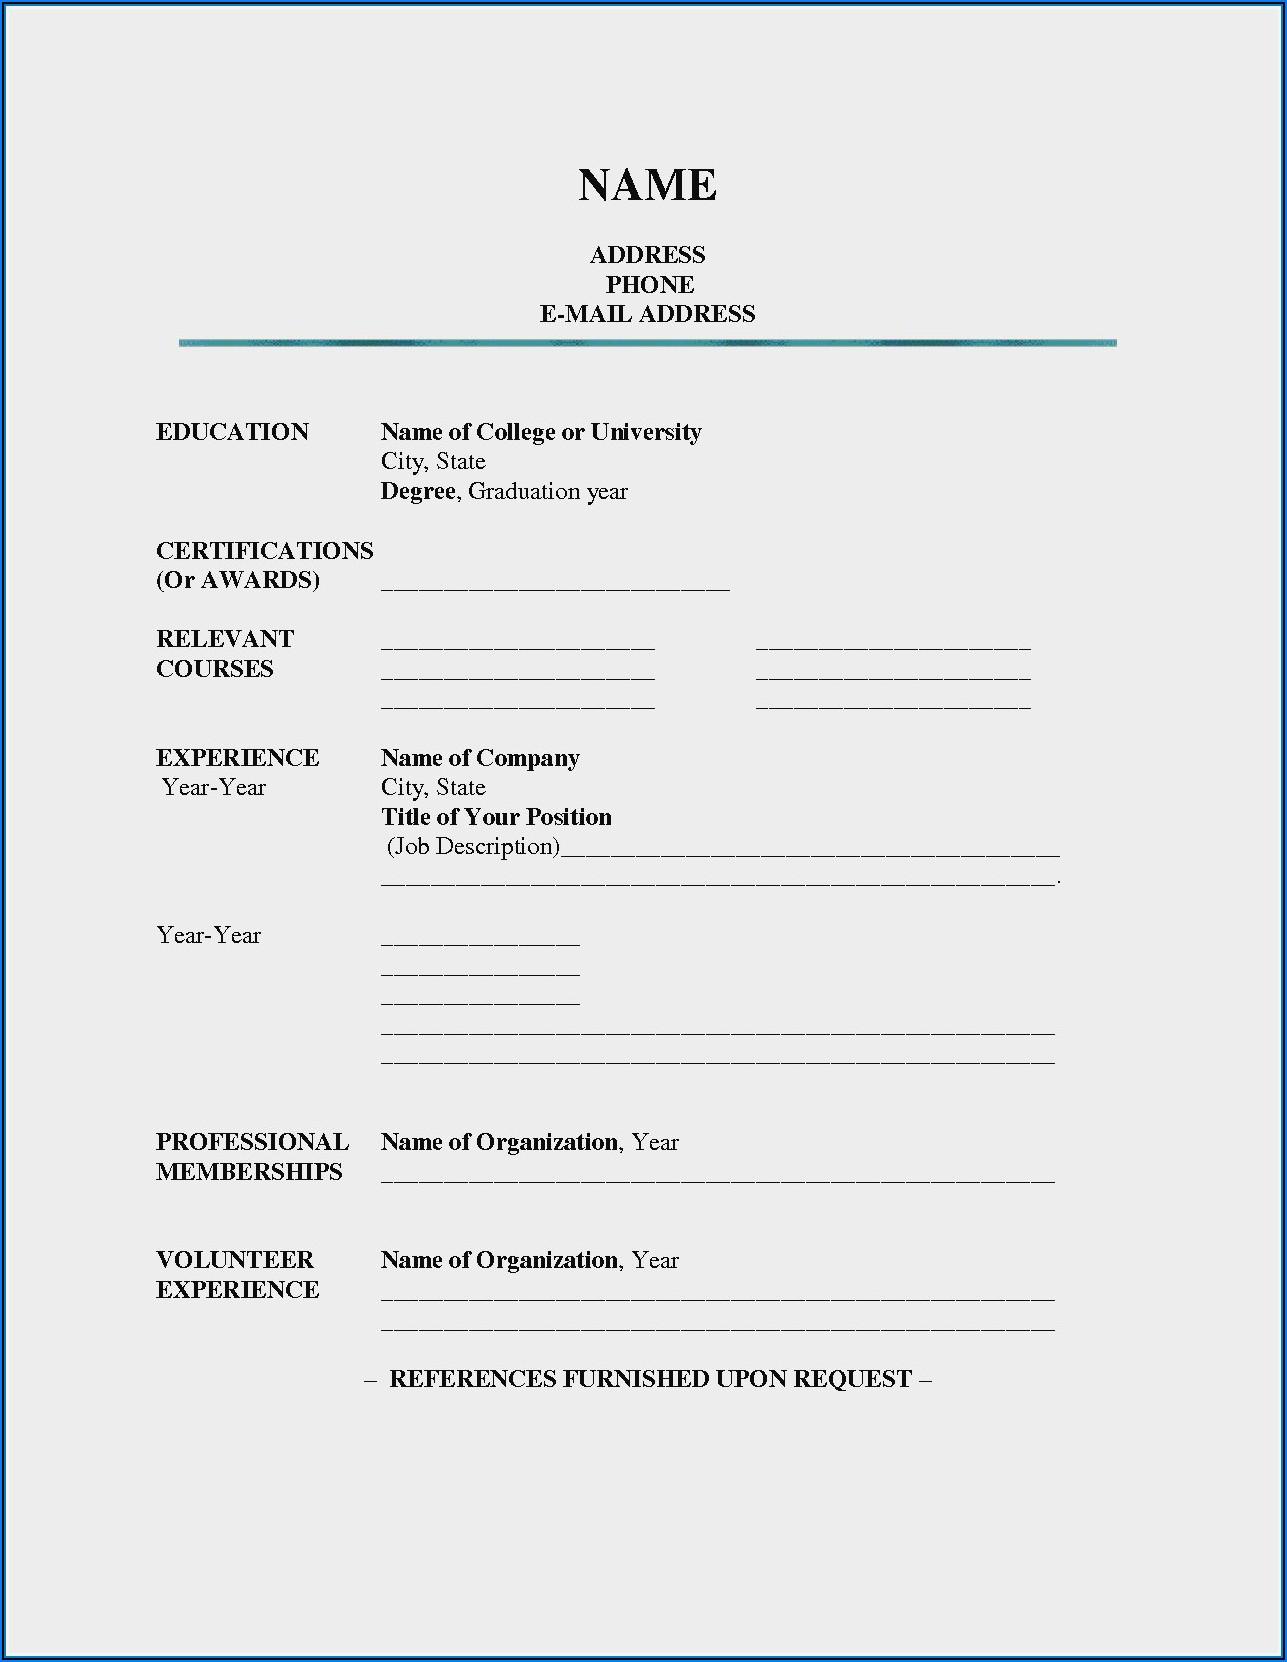 Resume Blank Form Sample